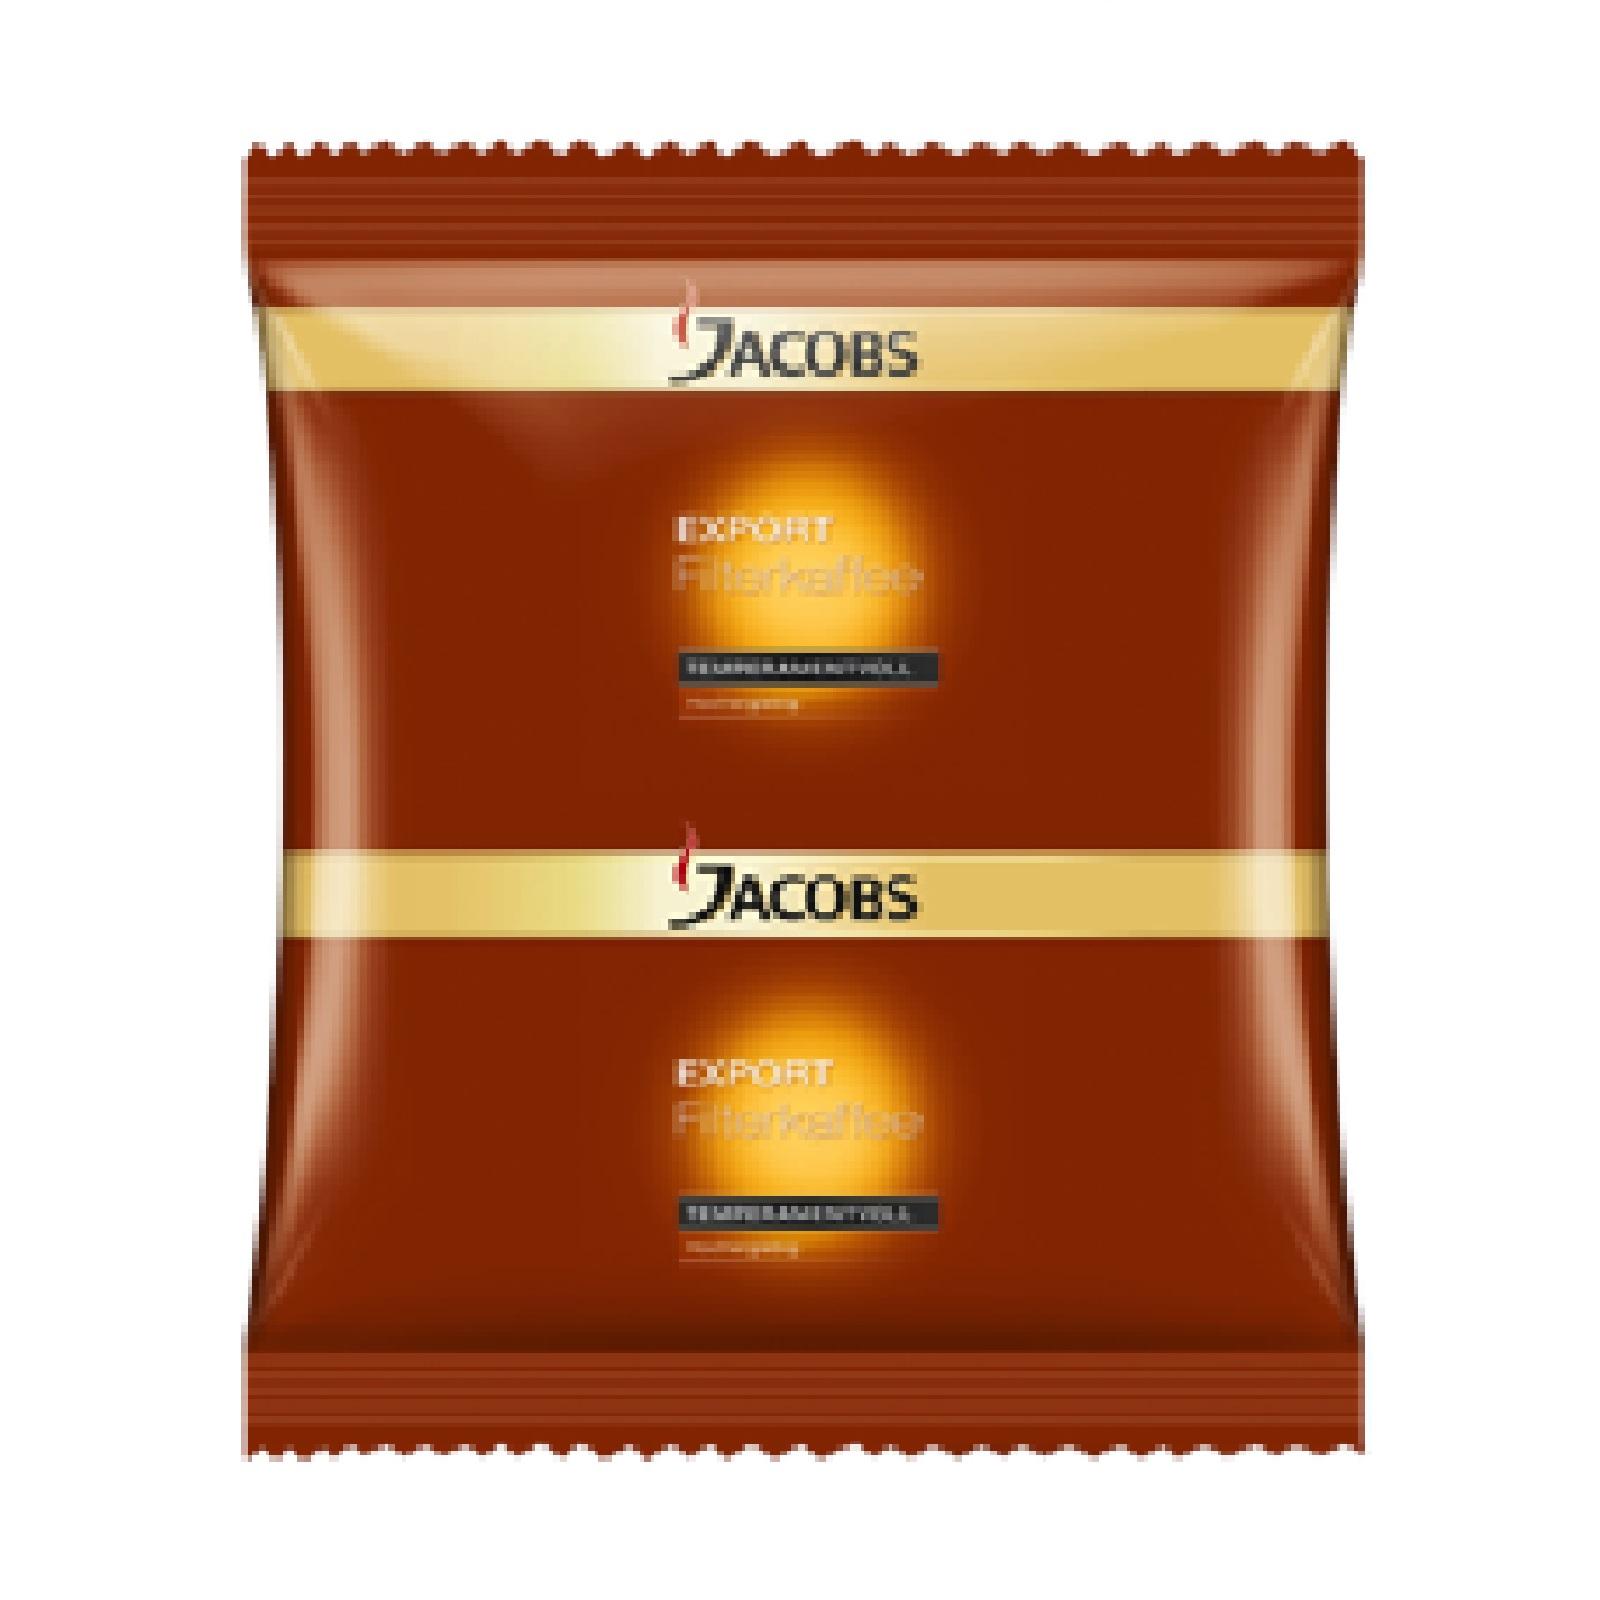 Jacobs Export Temperamentvoll HY 90 x 55g Röstkaffee gemahlen